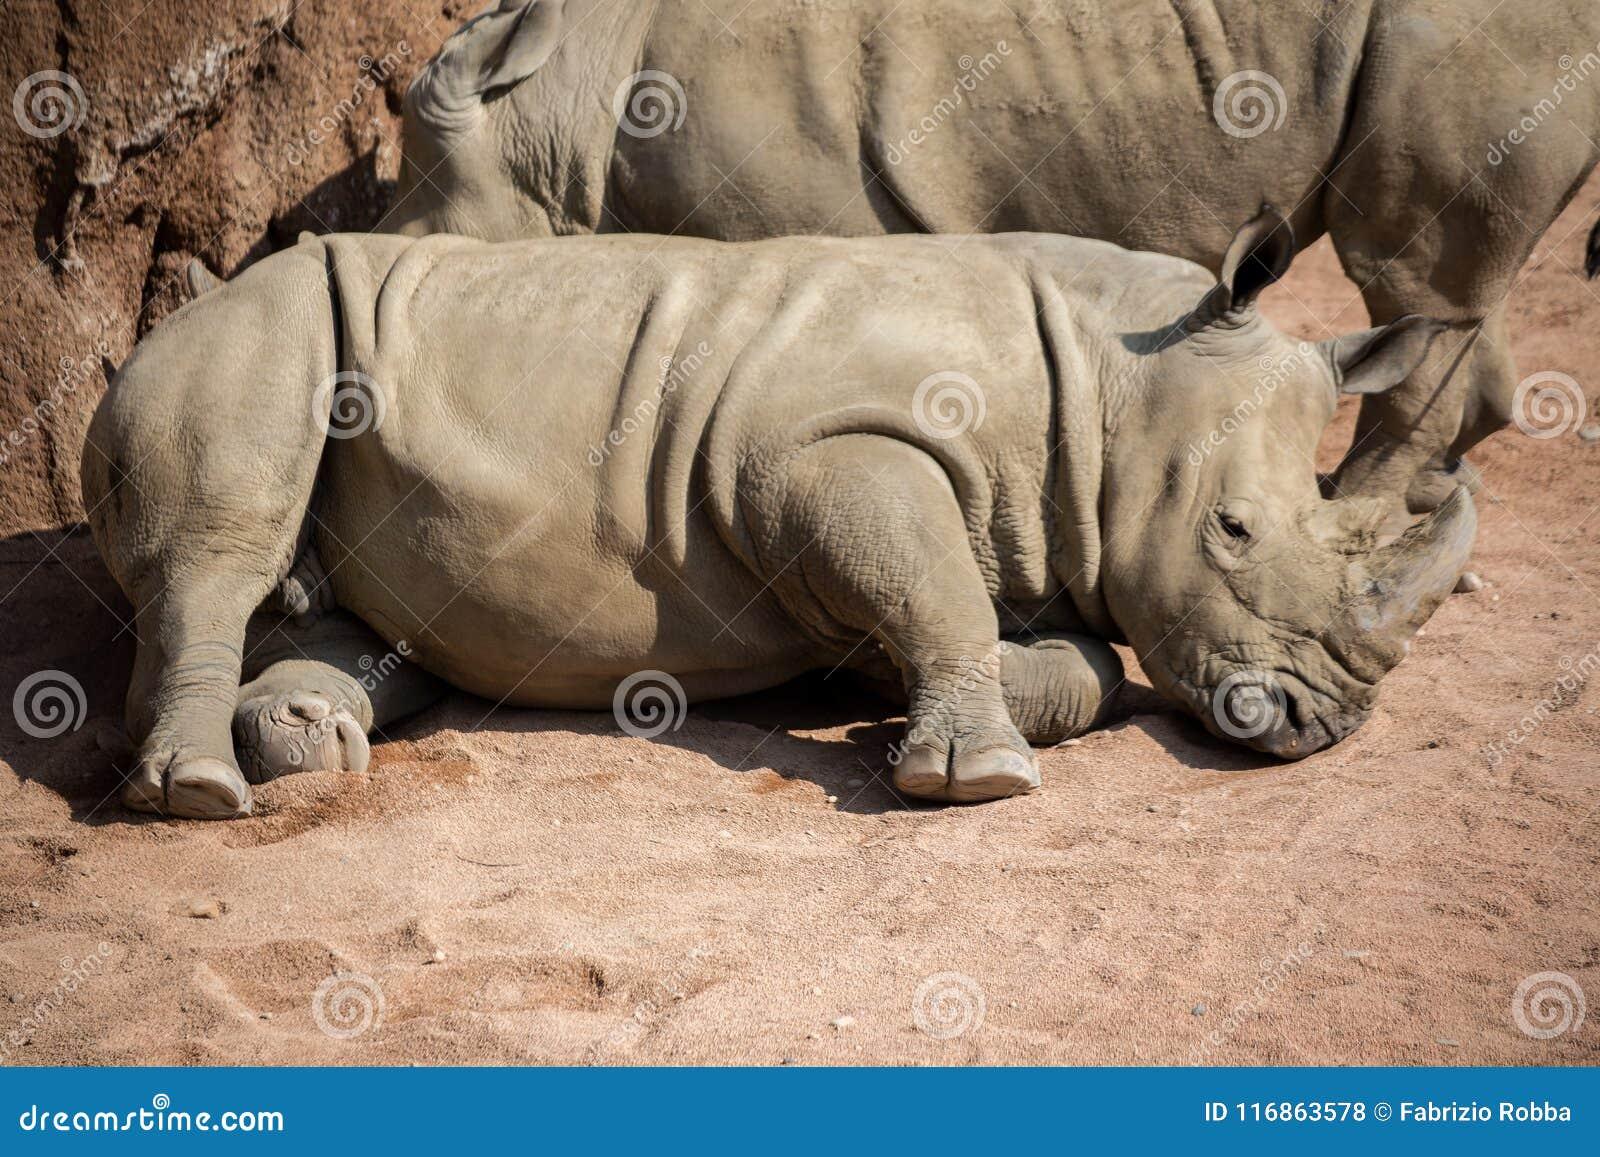 Rhino lies down in the dust